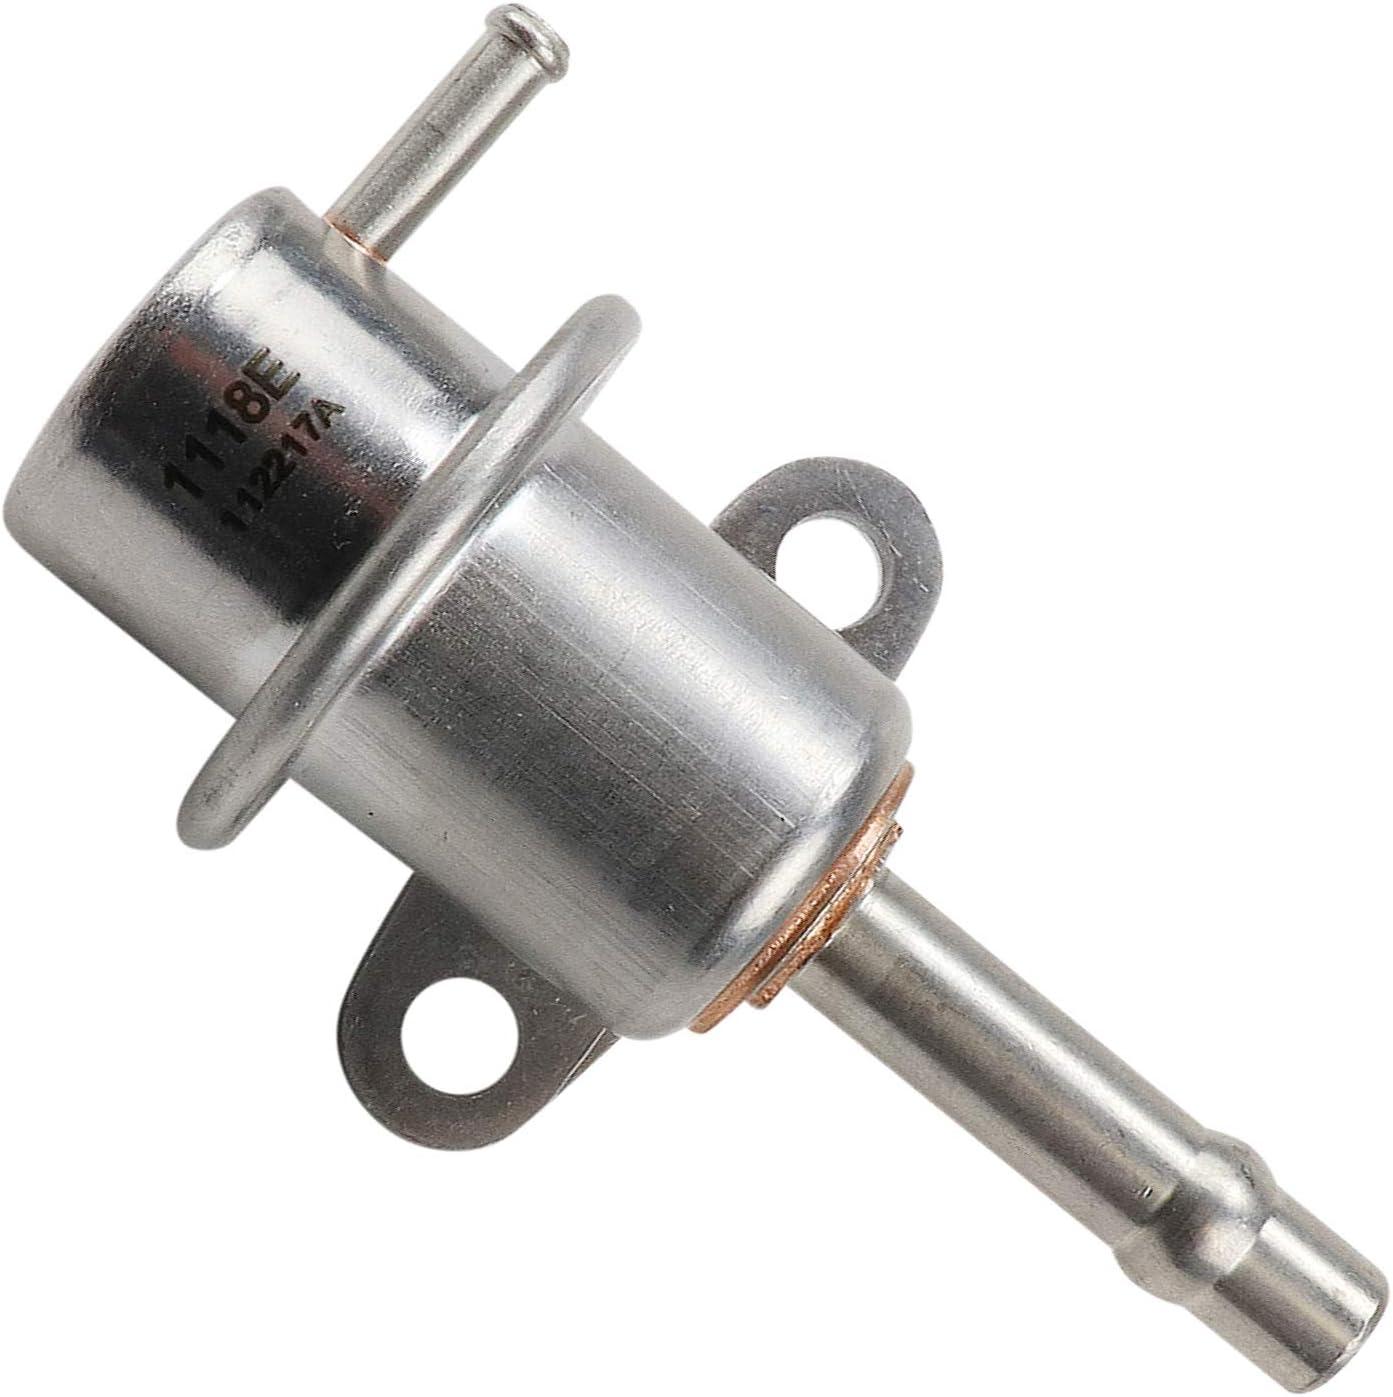 New Fuel Pressure Regulator Herko PR4041 For Nissan Infiniti 2000-2002